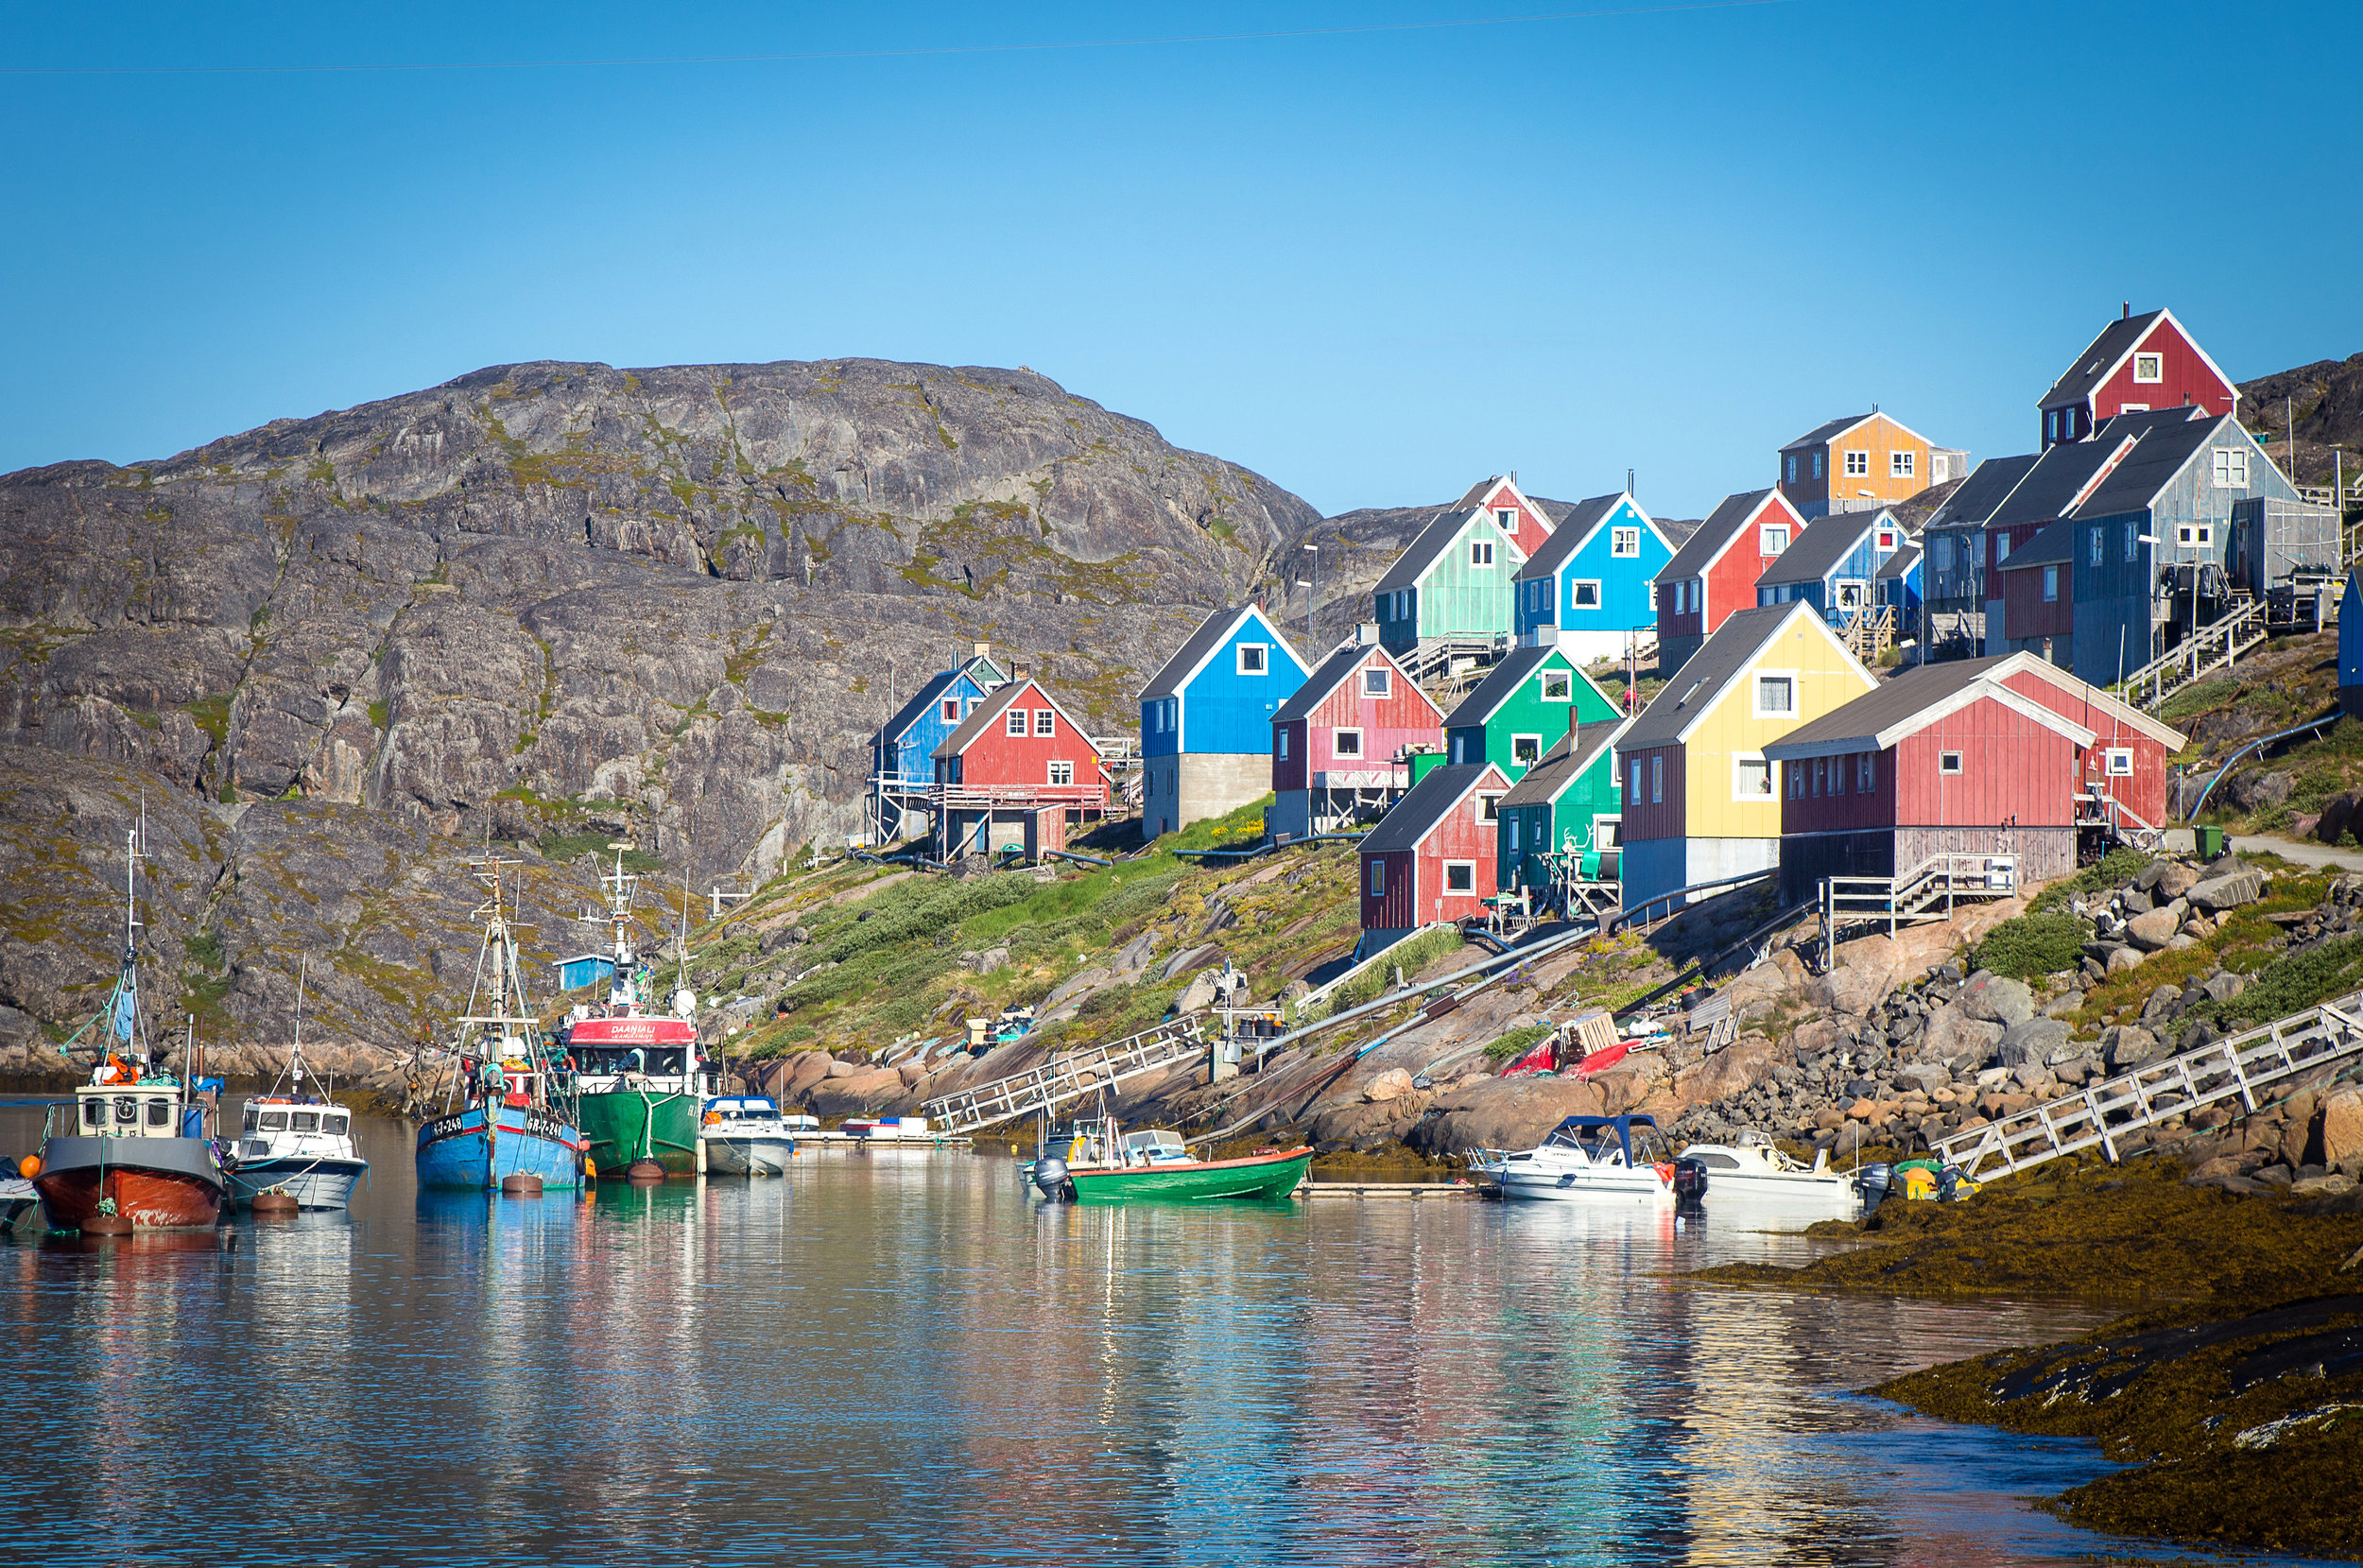 Groenland all-round - editie 2020: 18-30 juni : coming soon